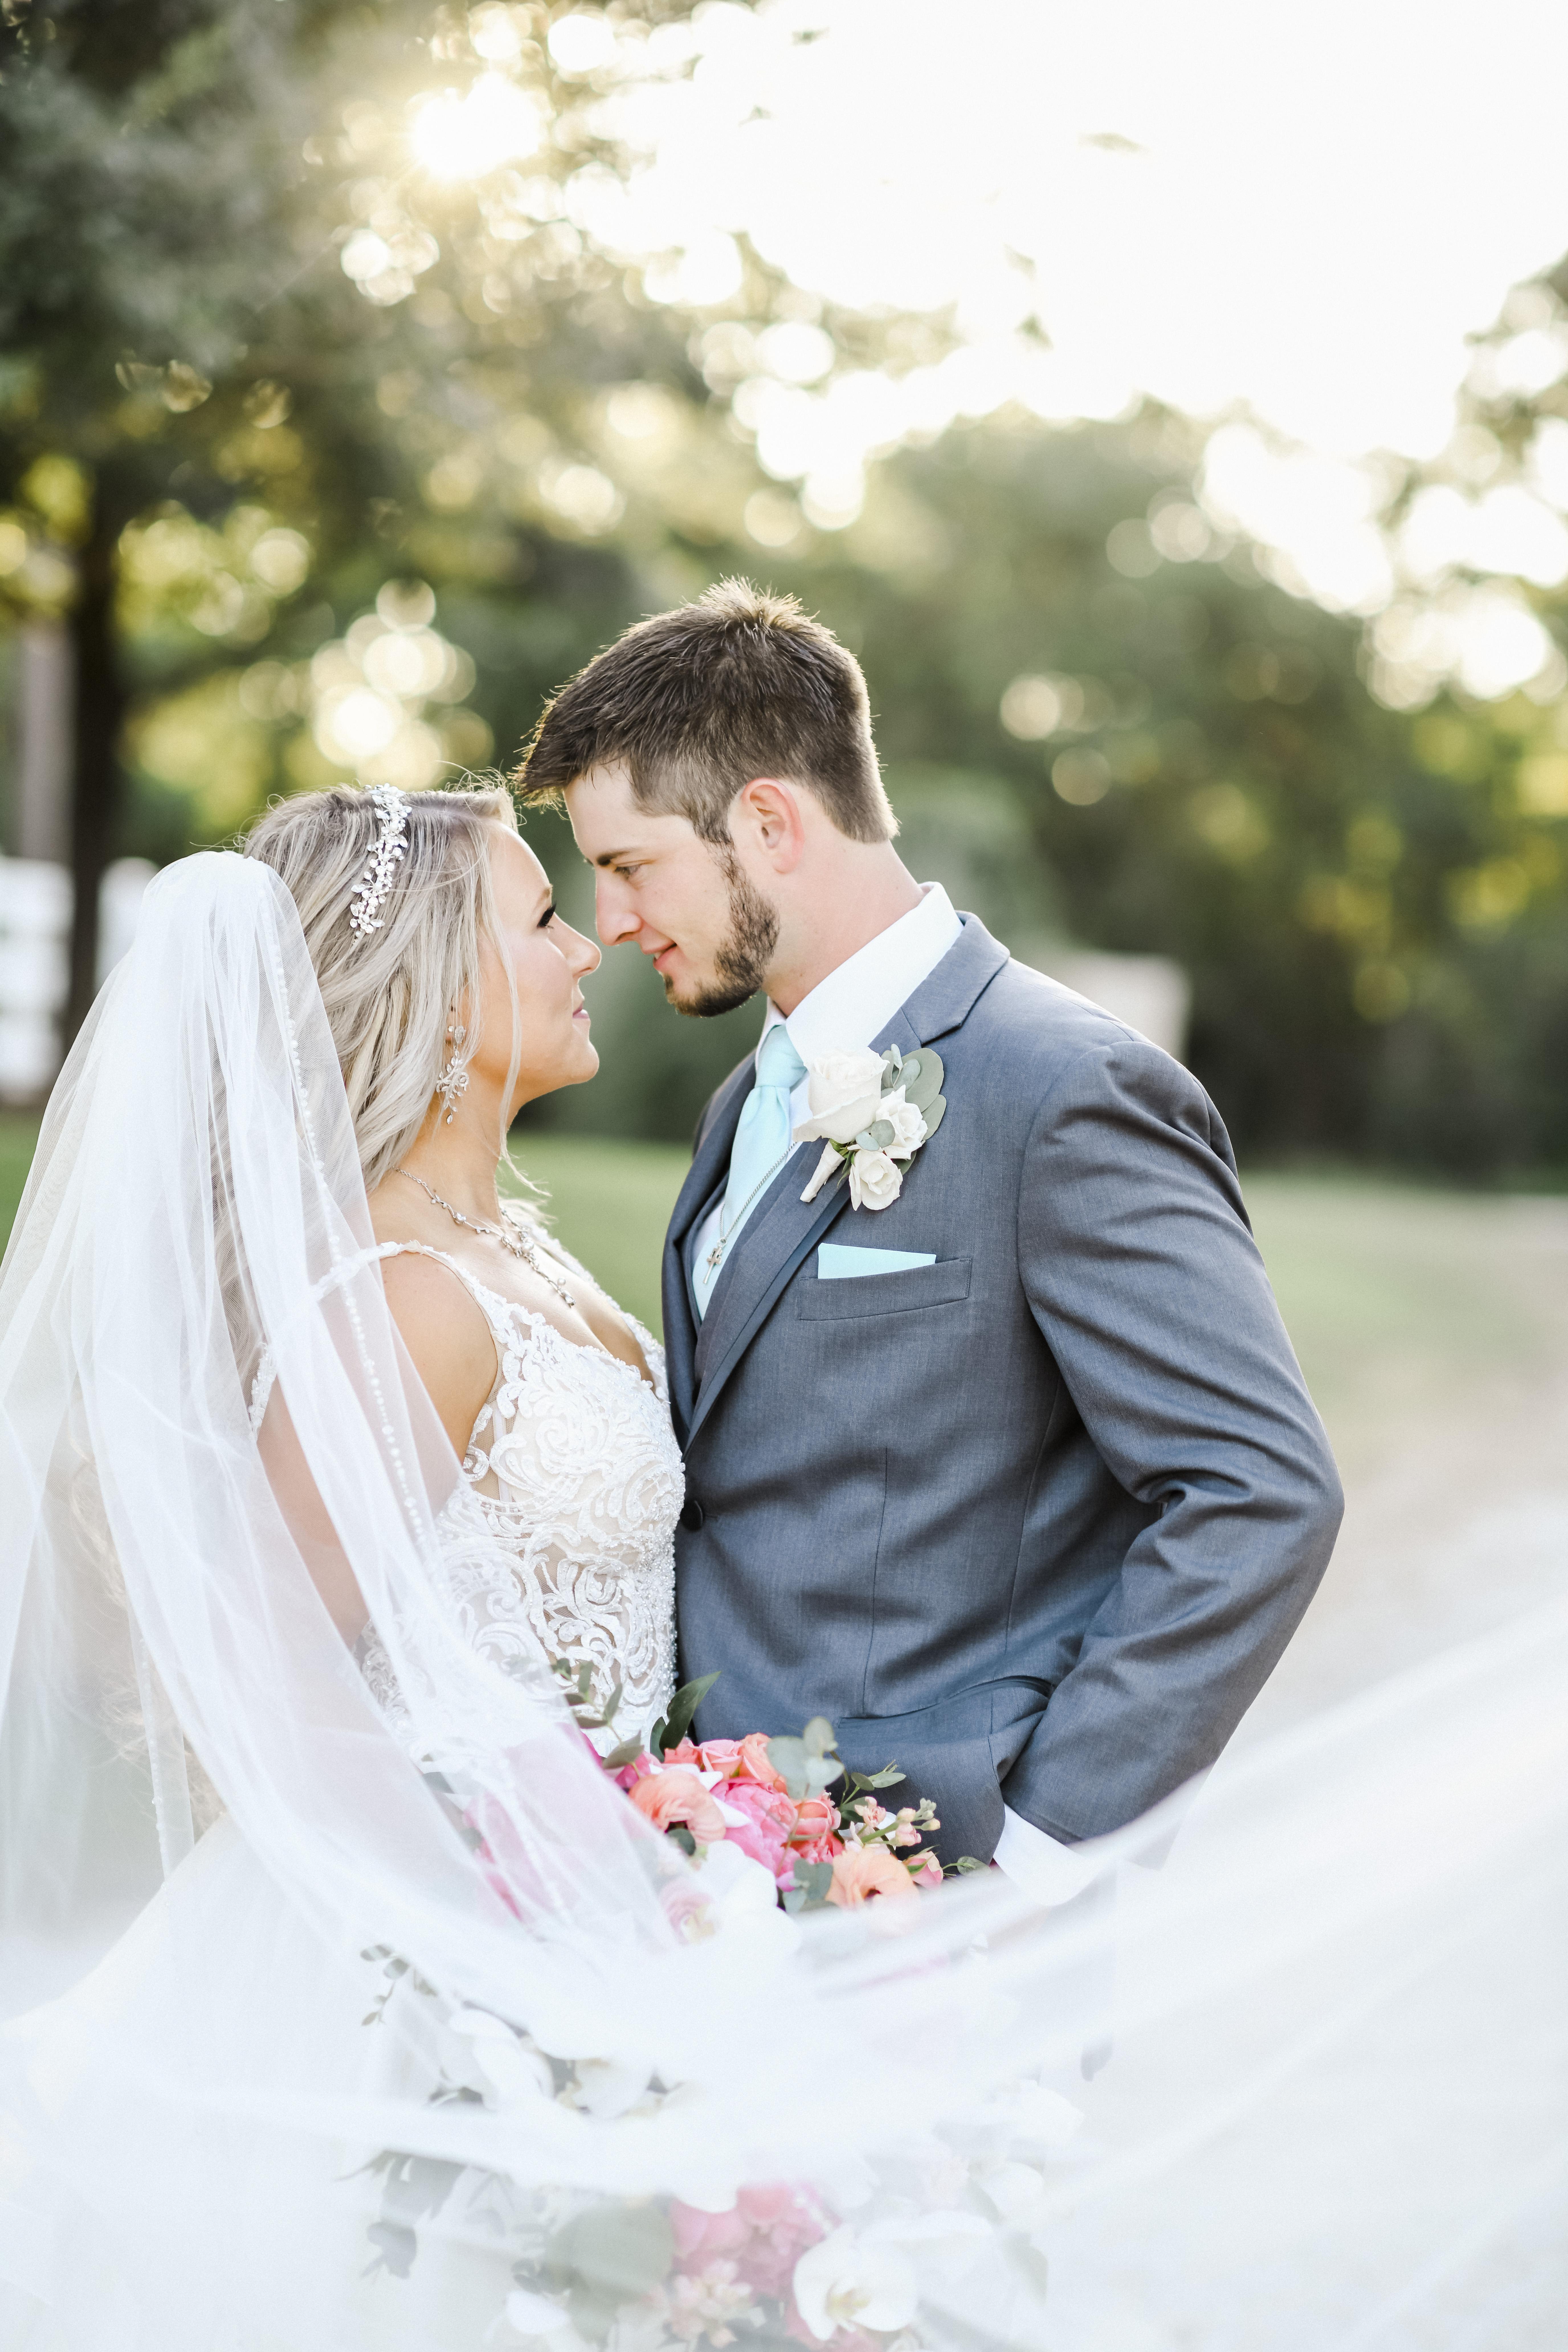 Sierra & Brad's Summer Wedding at The Inn At Quarry Ridge in Bryan TX with Rachel Driskell Photography